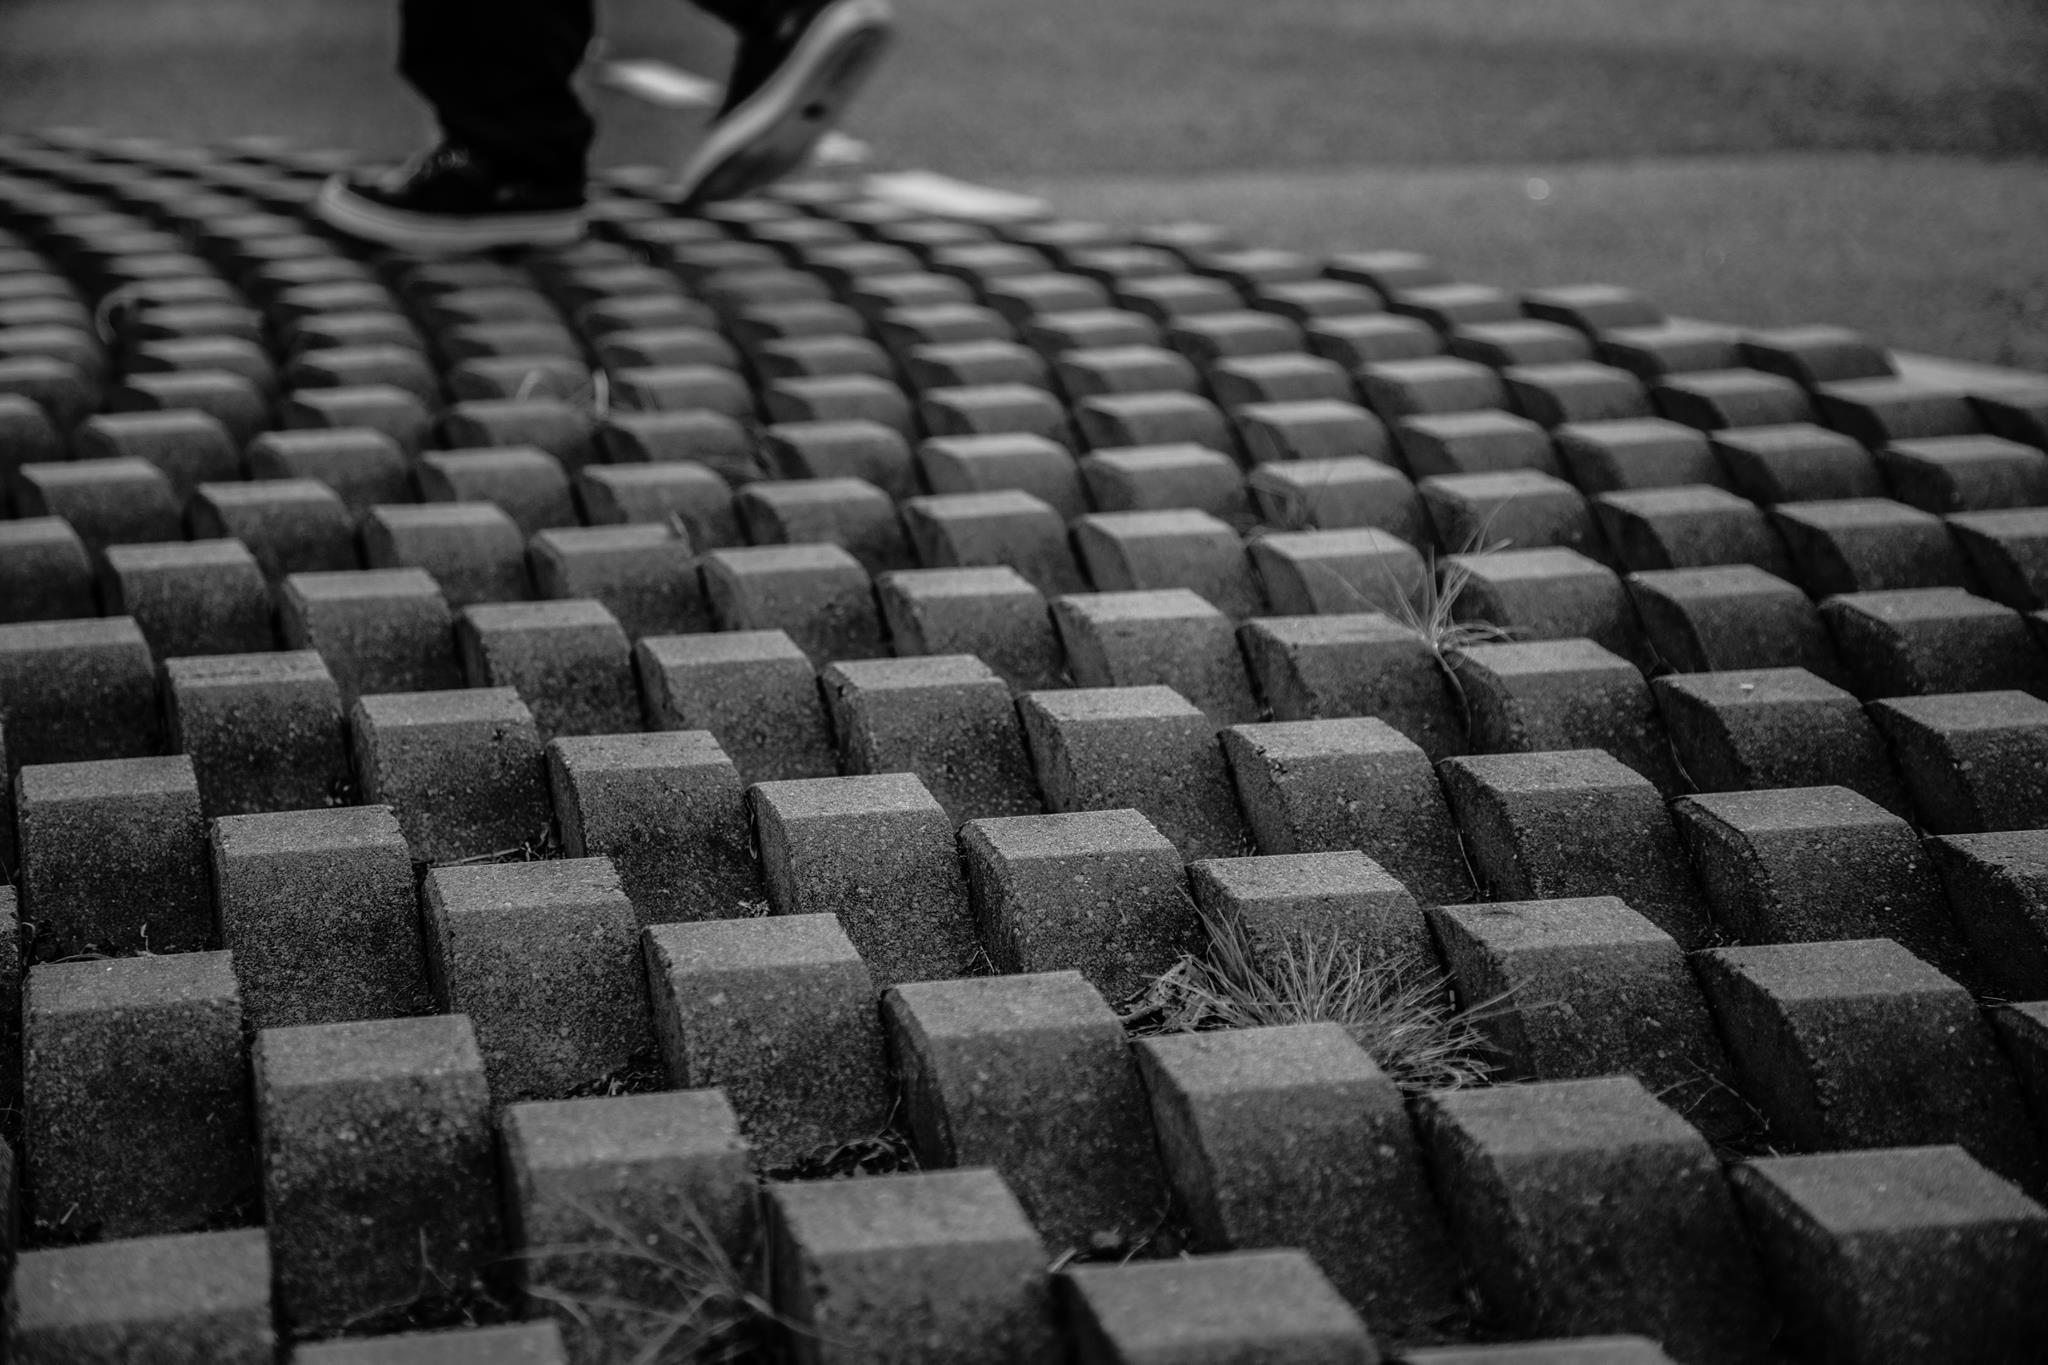 person standing on concrete block